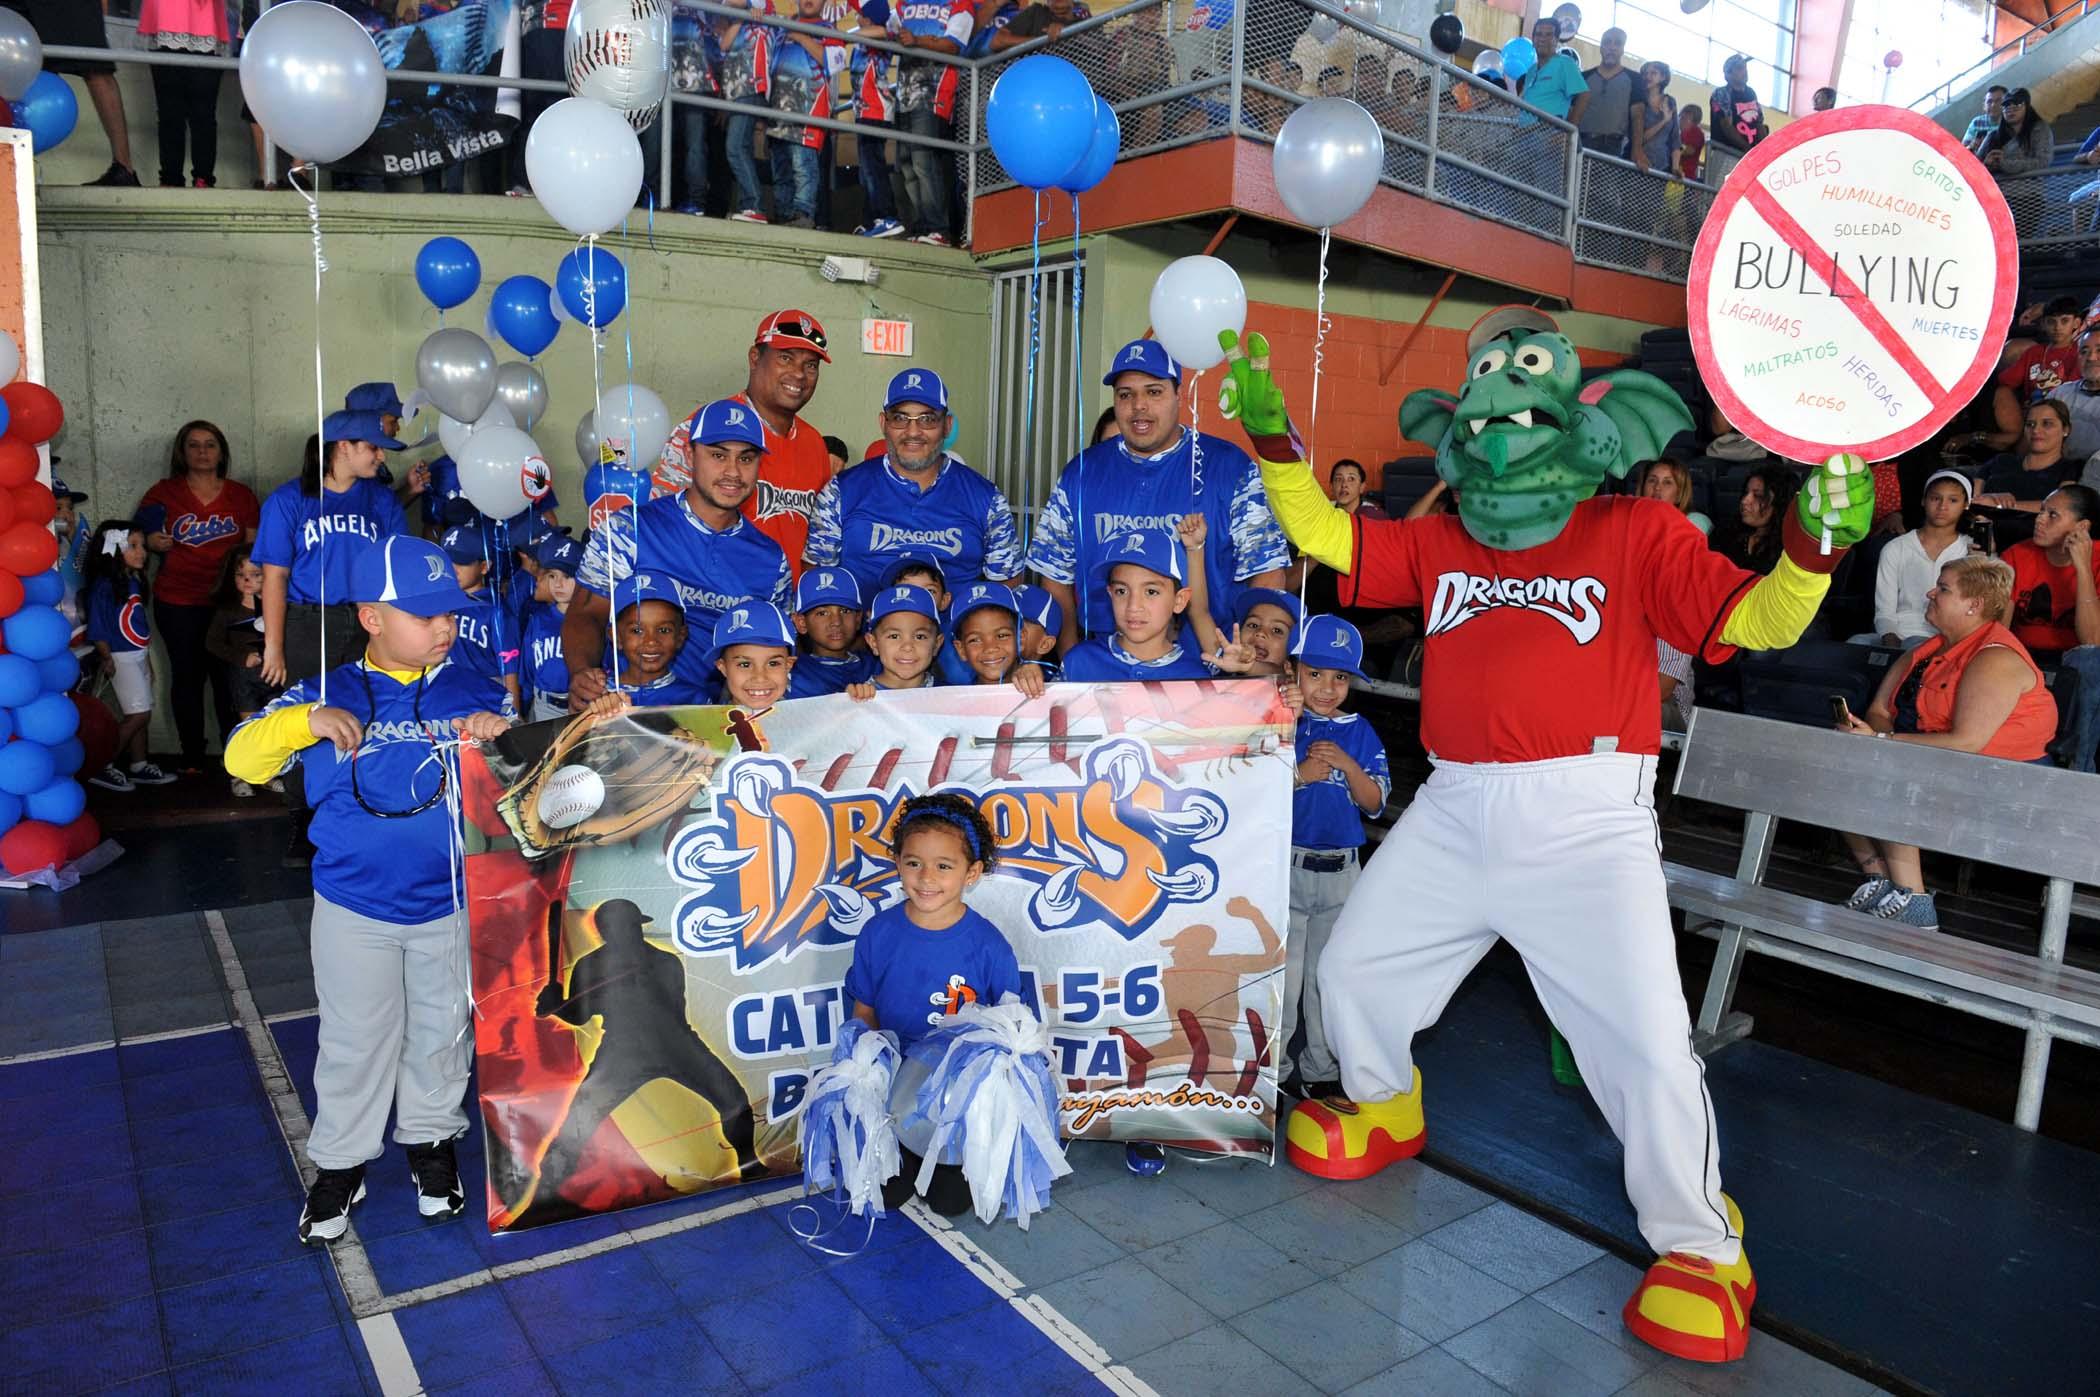 Inauguracion Pequenas Ligas Bayamon - Equipo Dragons